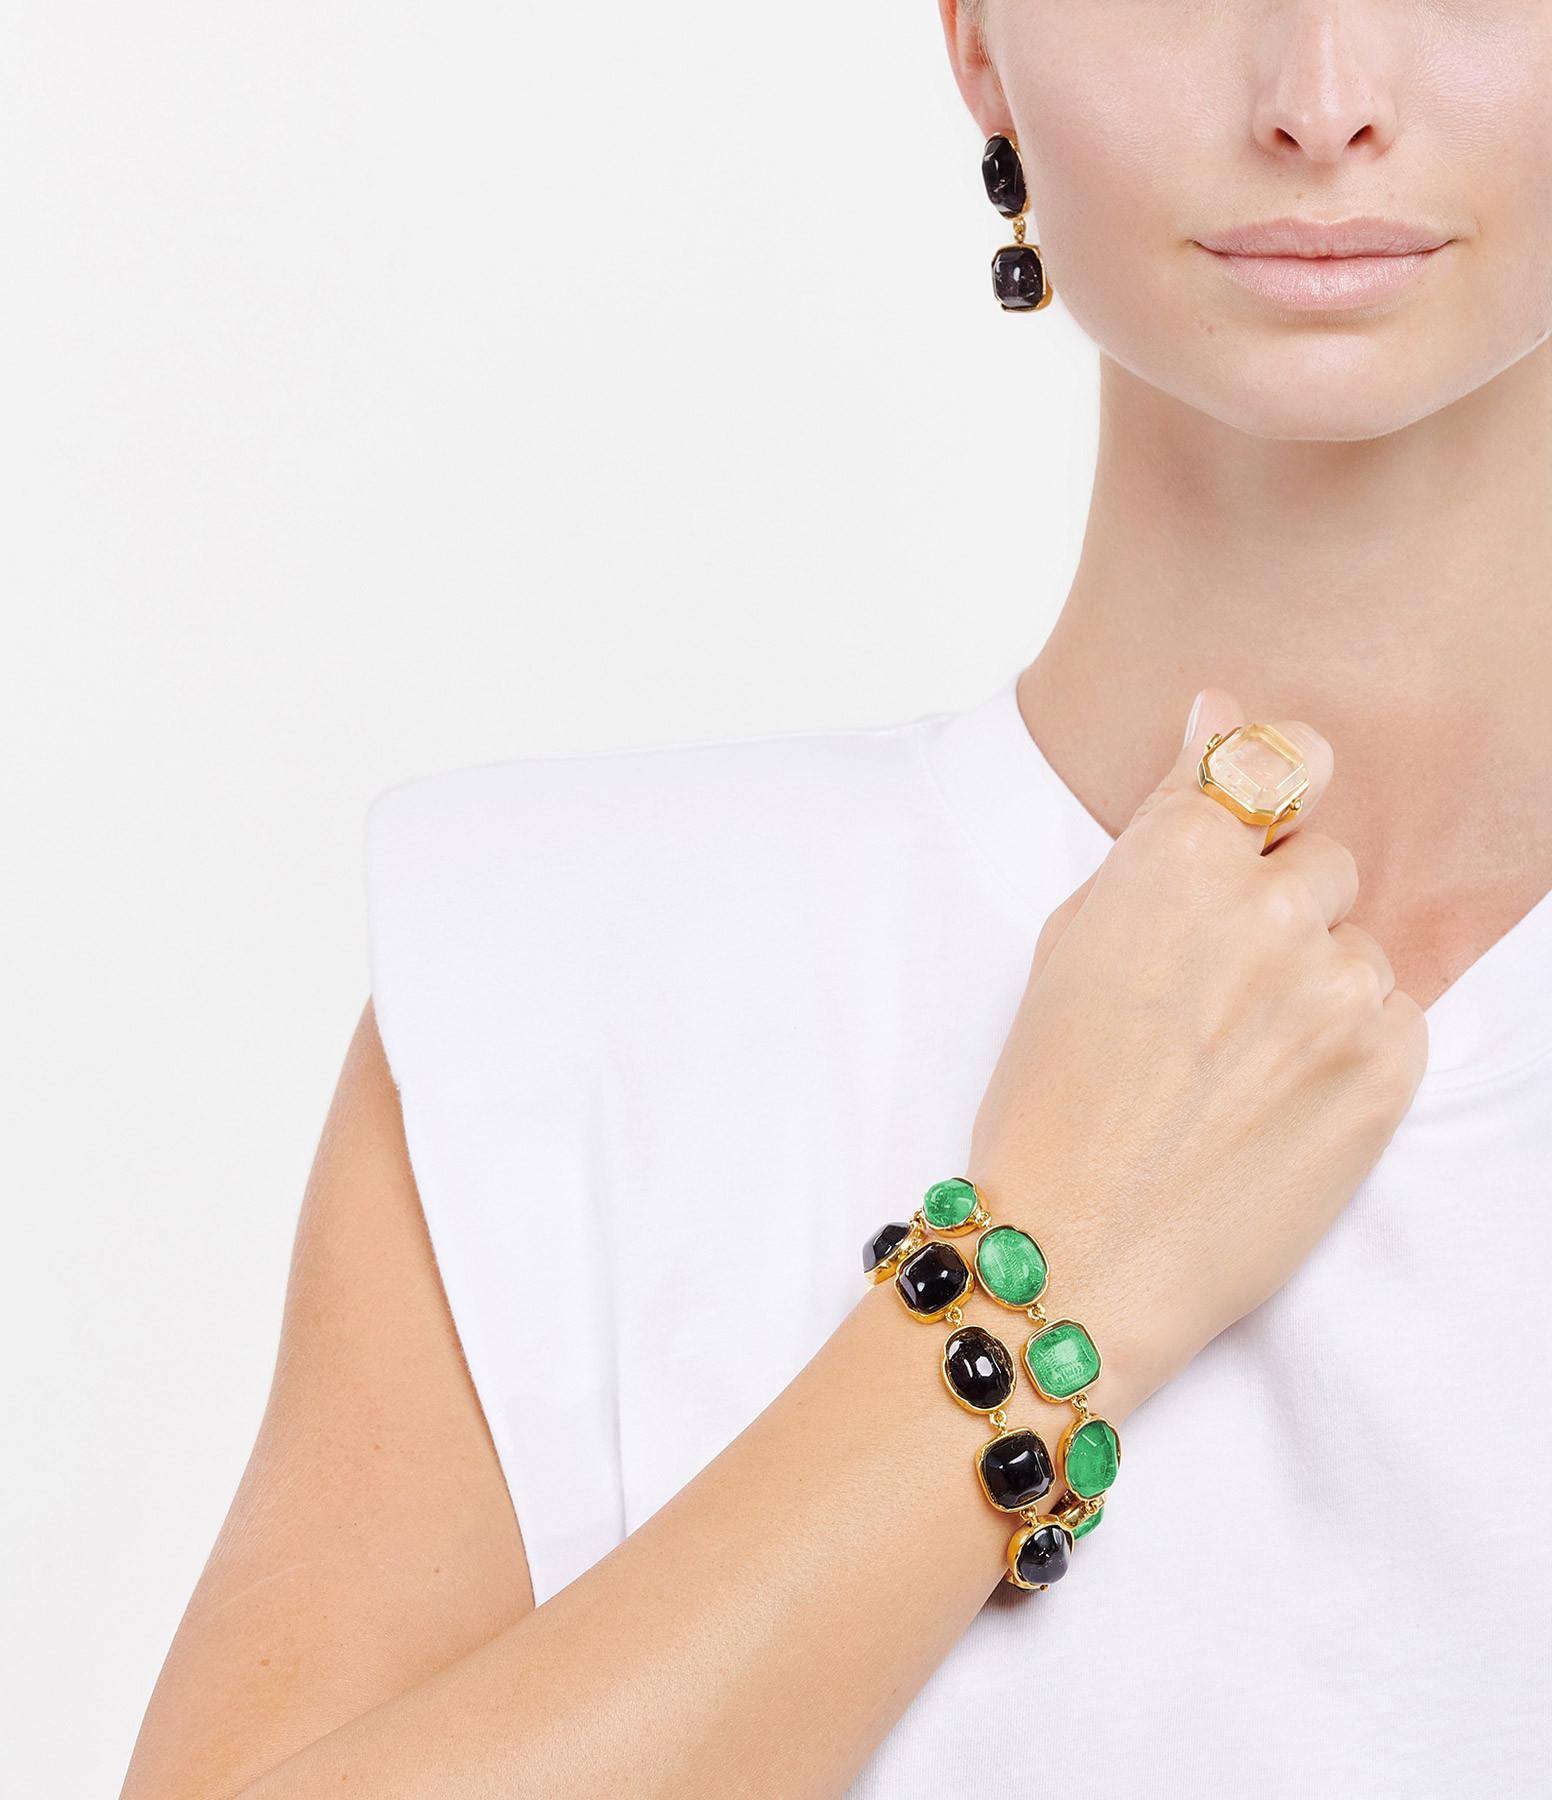 GOOSSENS - Bracelet Cabochons Vert Émeraude